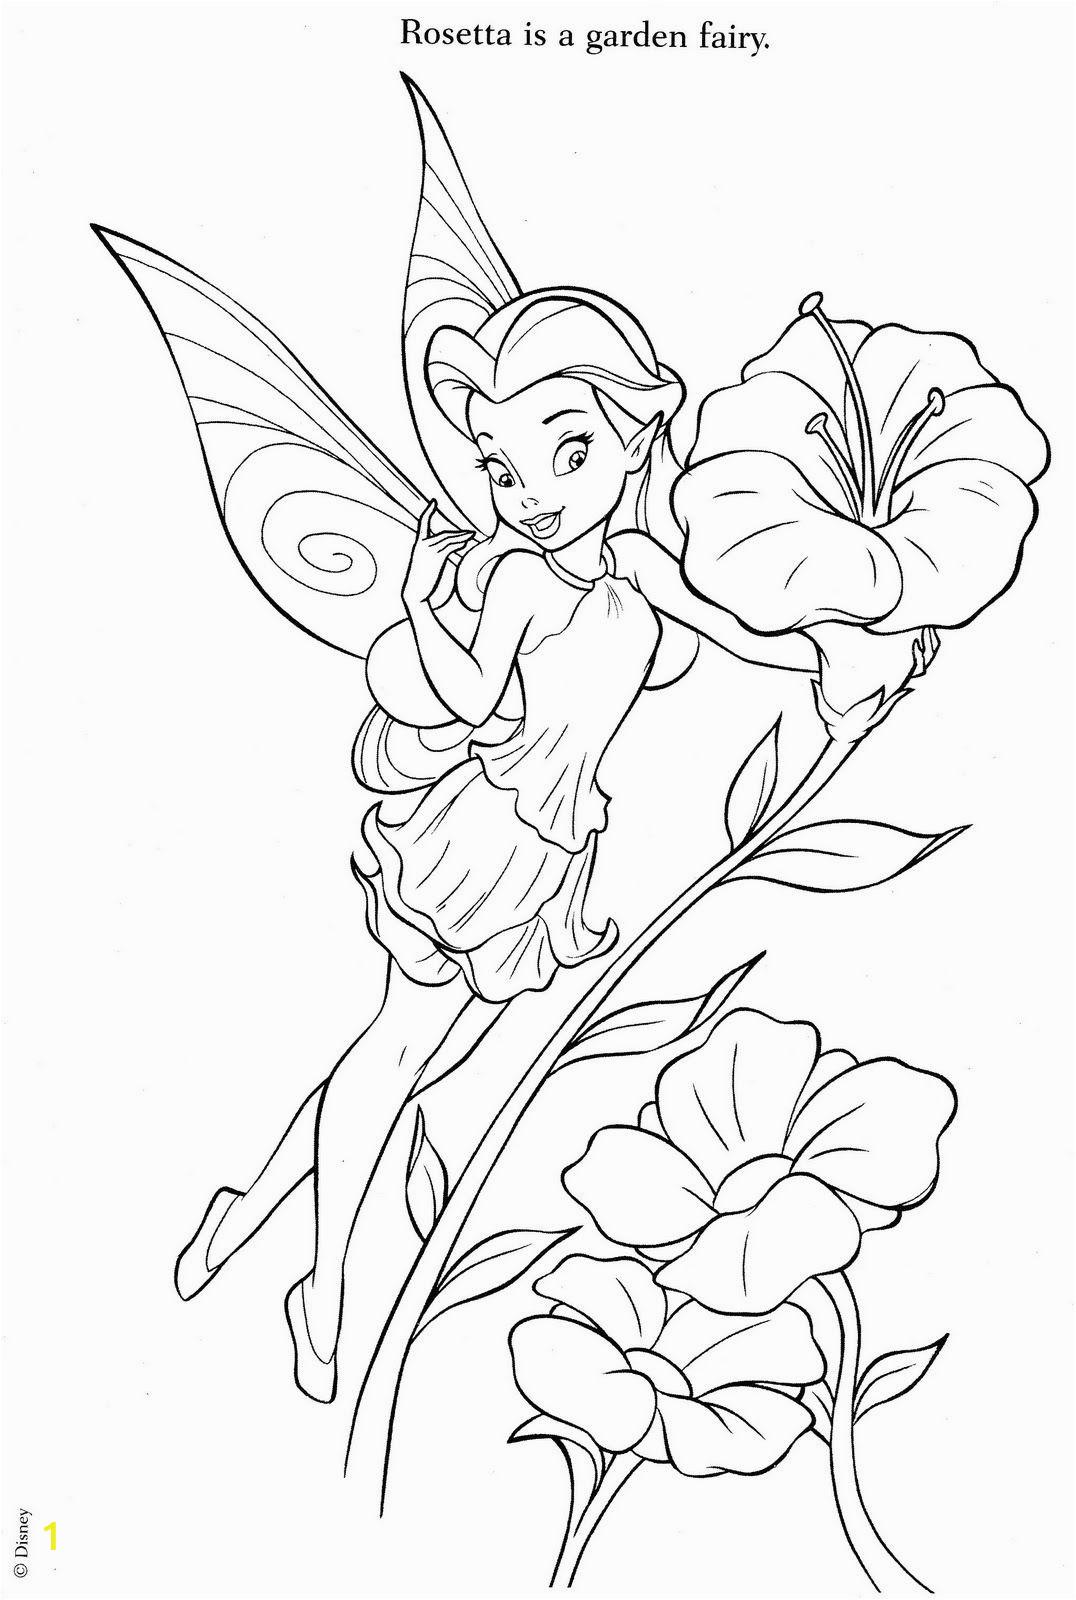 Disney Fairies Coloring Pages Rosetta   divyajanani.org